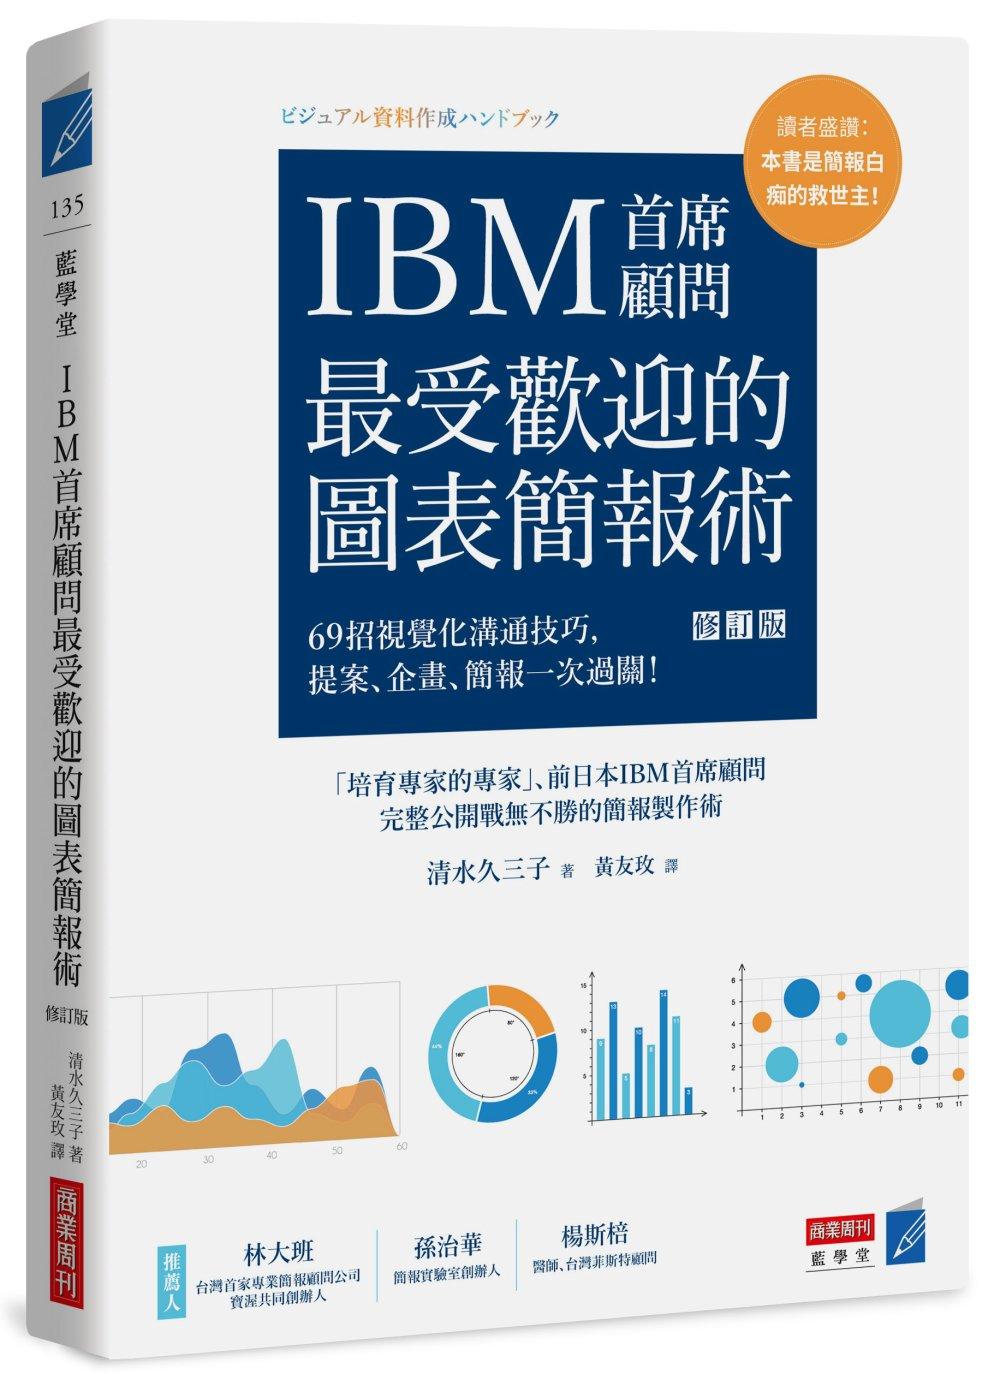 IBM首席顧問最受歡迎的圖表簡...